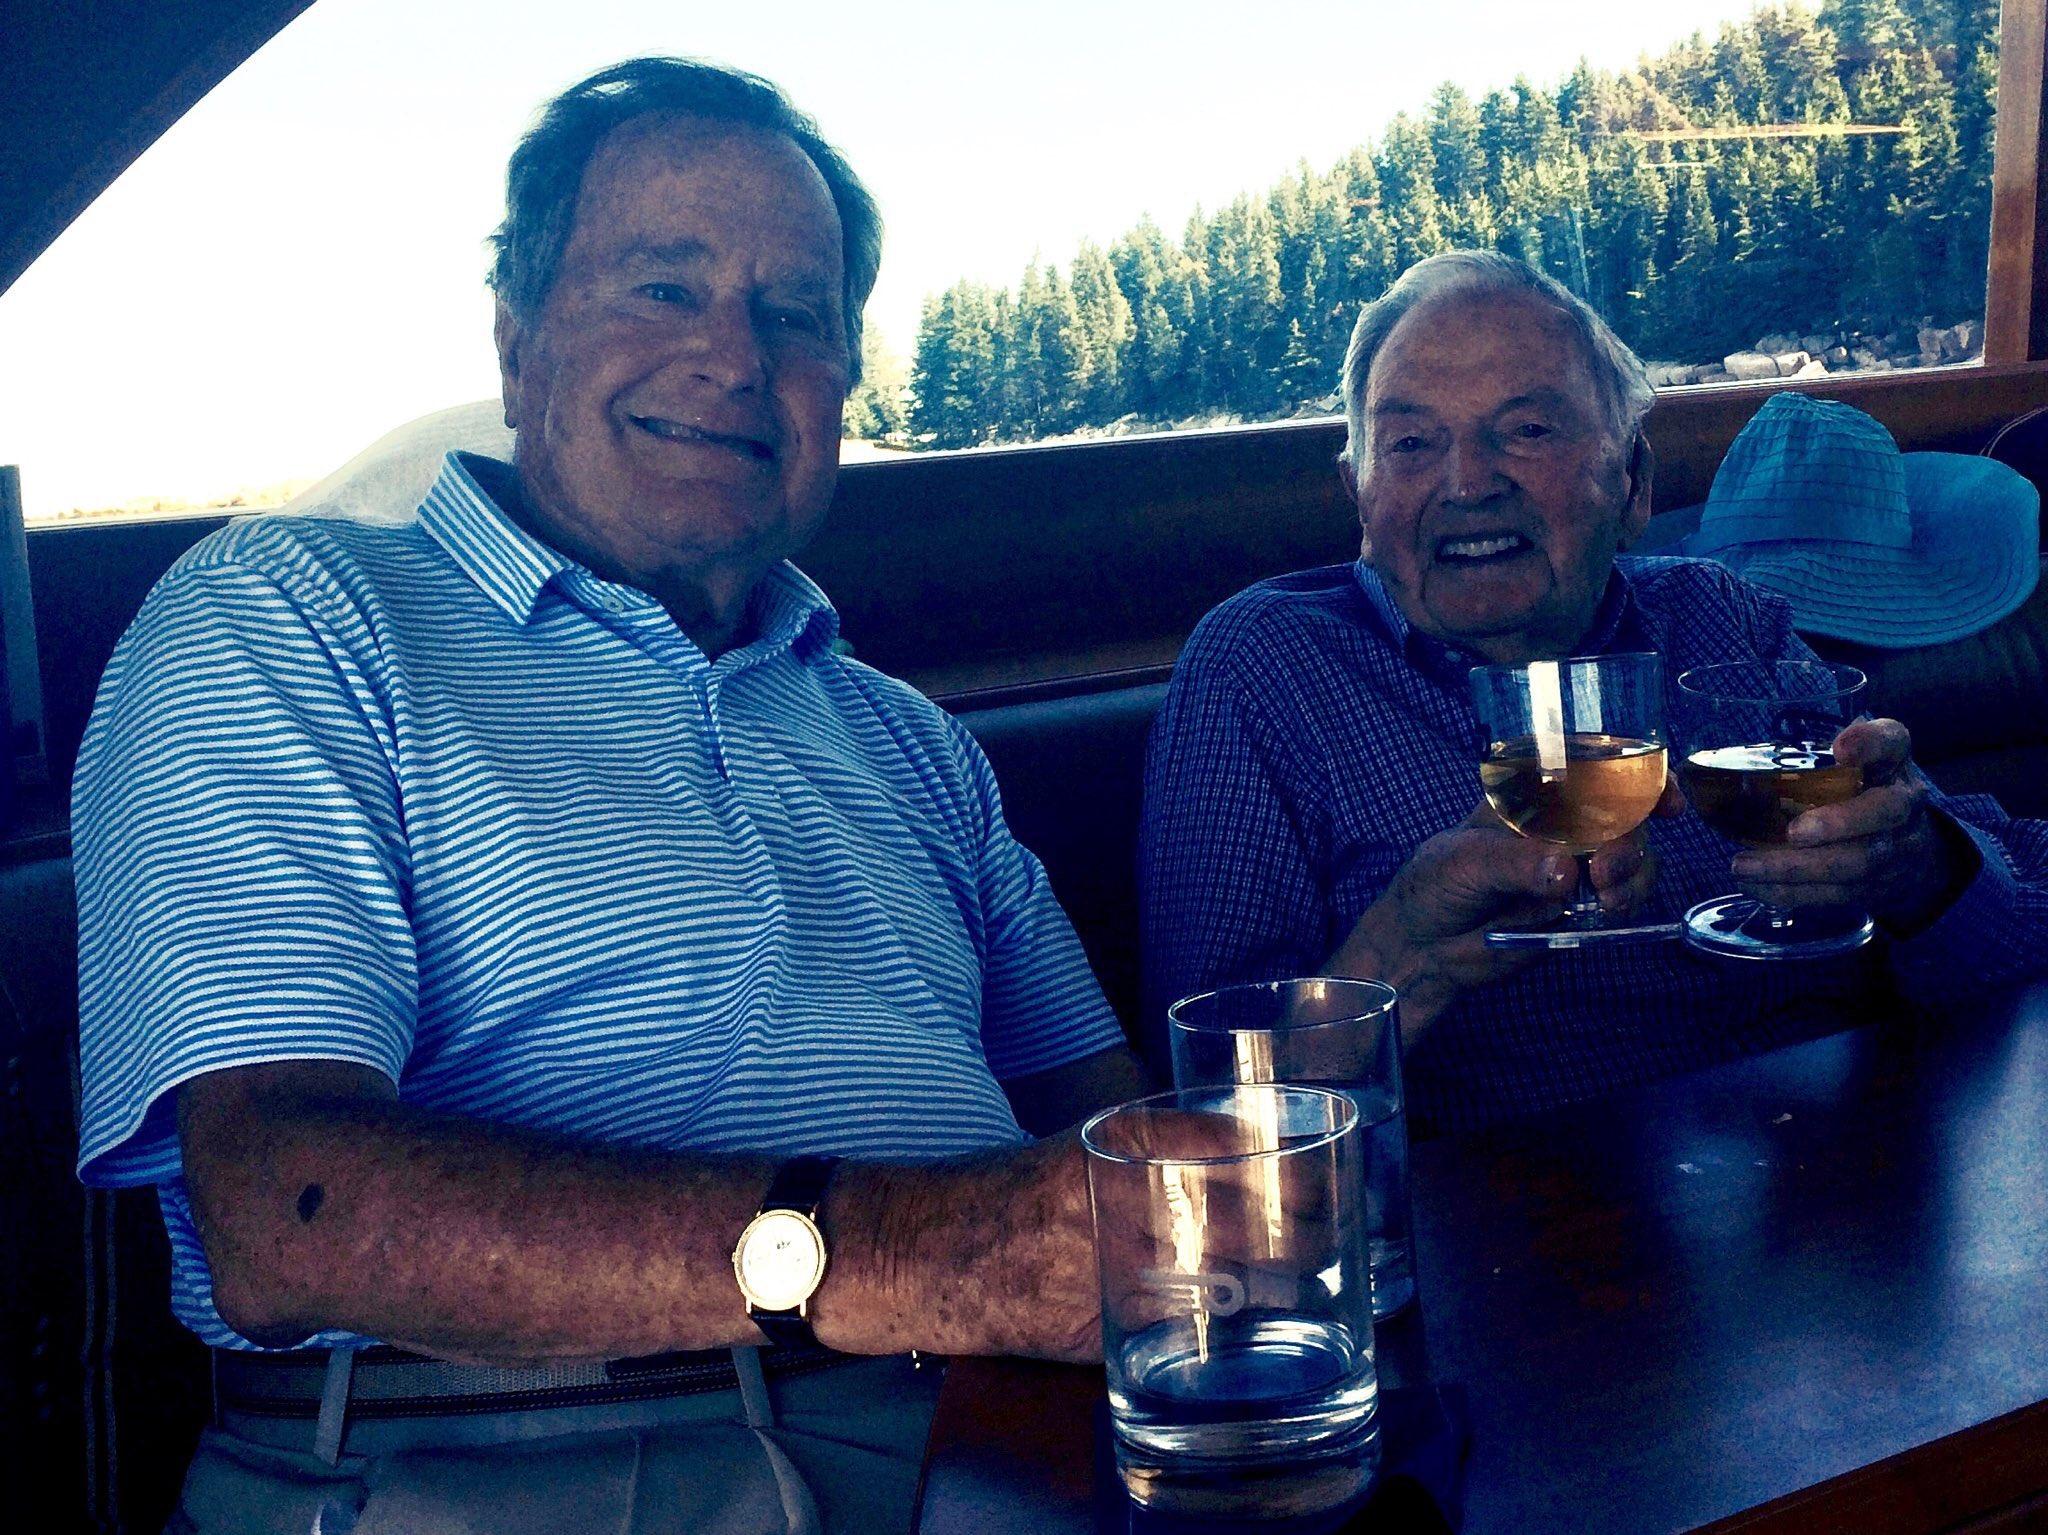 George Bush and David Rockefeller